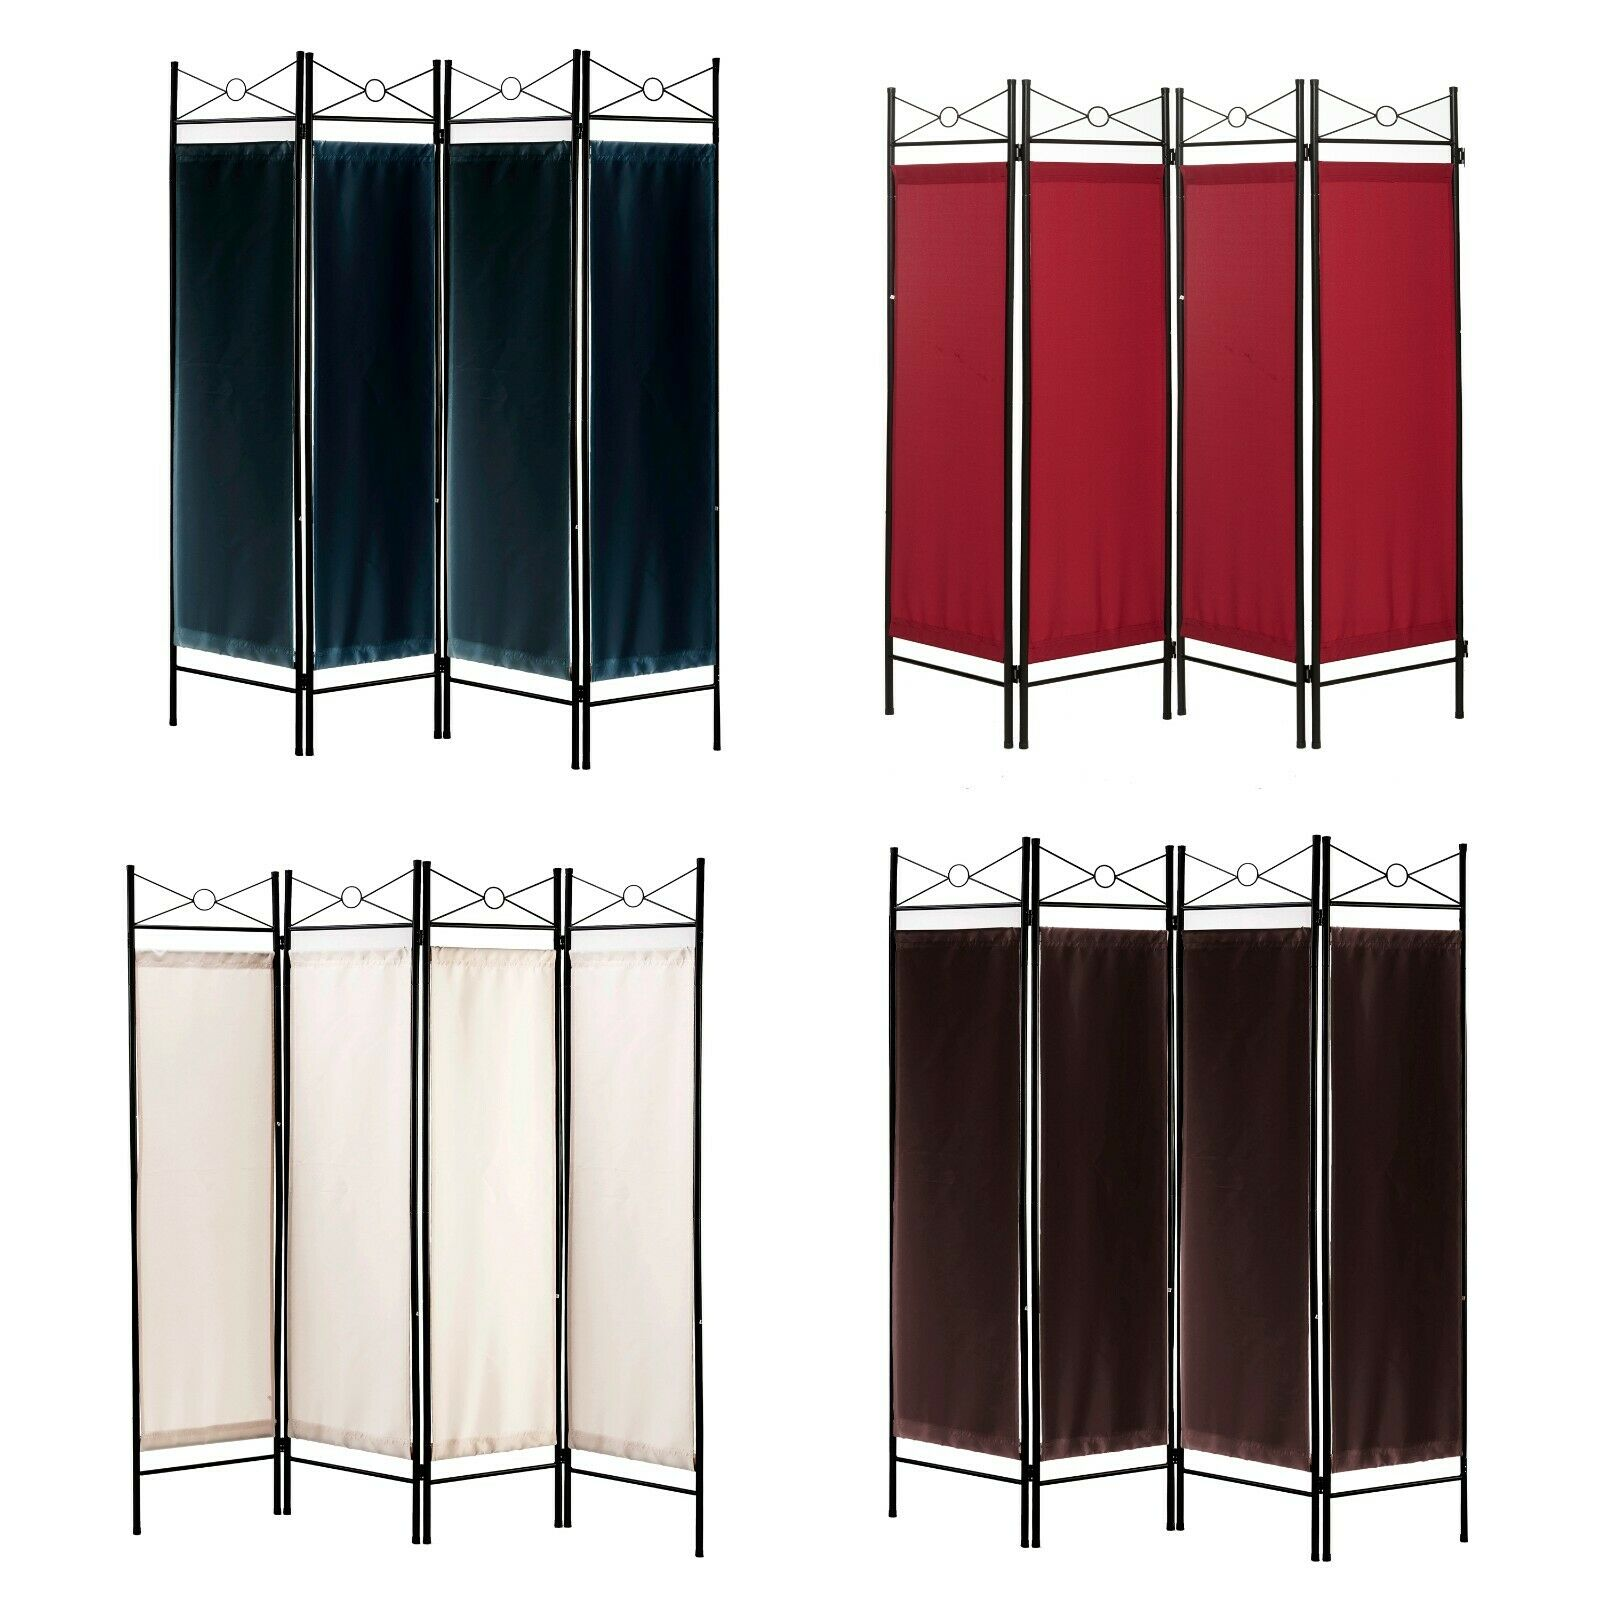 4, 6, 8 Panels Metal Room Divider Screen Black, White, Brown